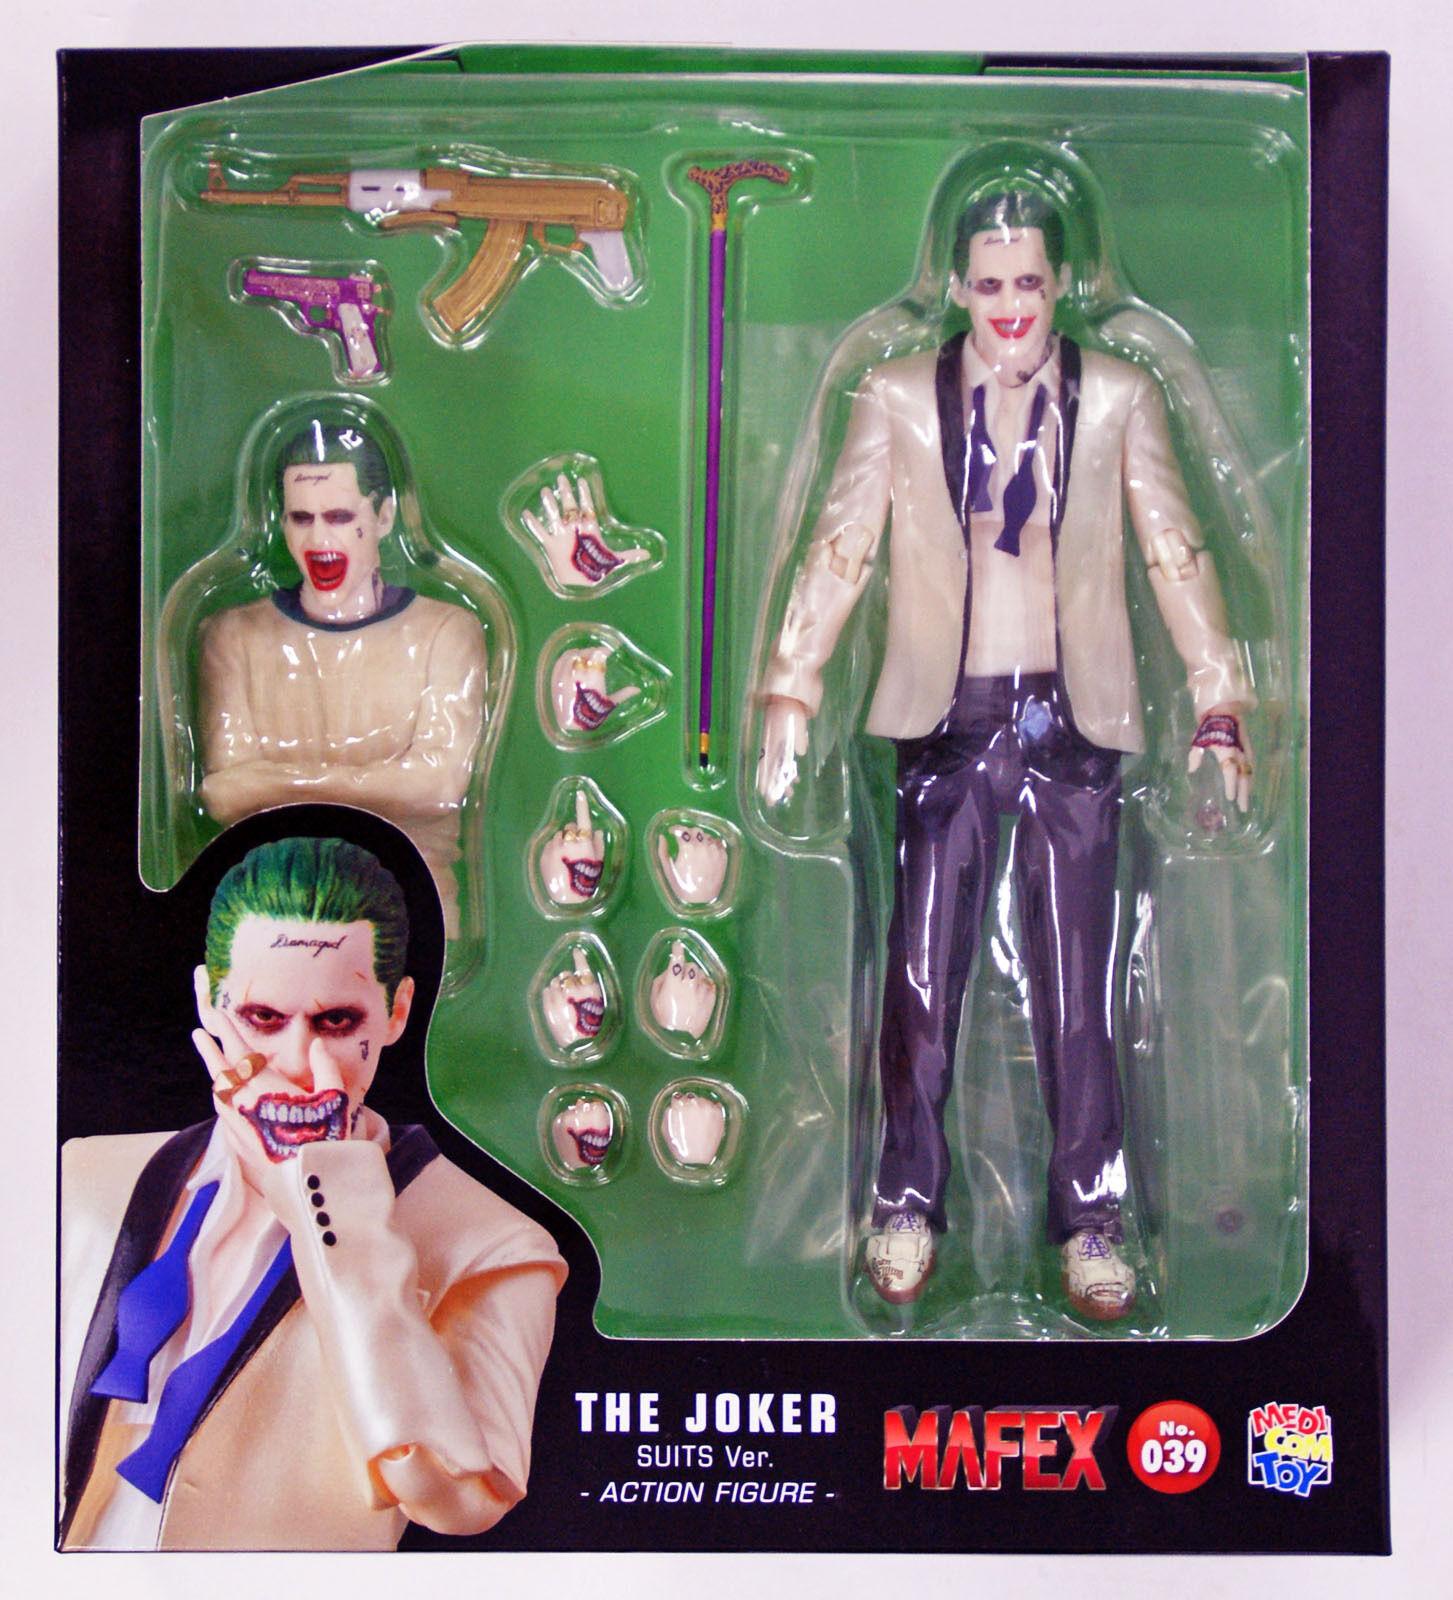 Medicom MAFEX 039 The Joker  Suit Ver. from Suicide Squad Action Figure  approvisionnement direct des fabricants